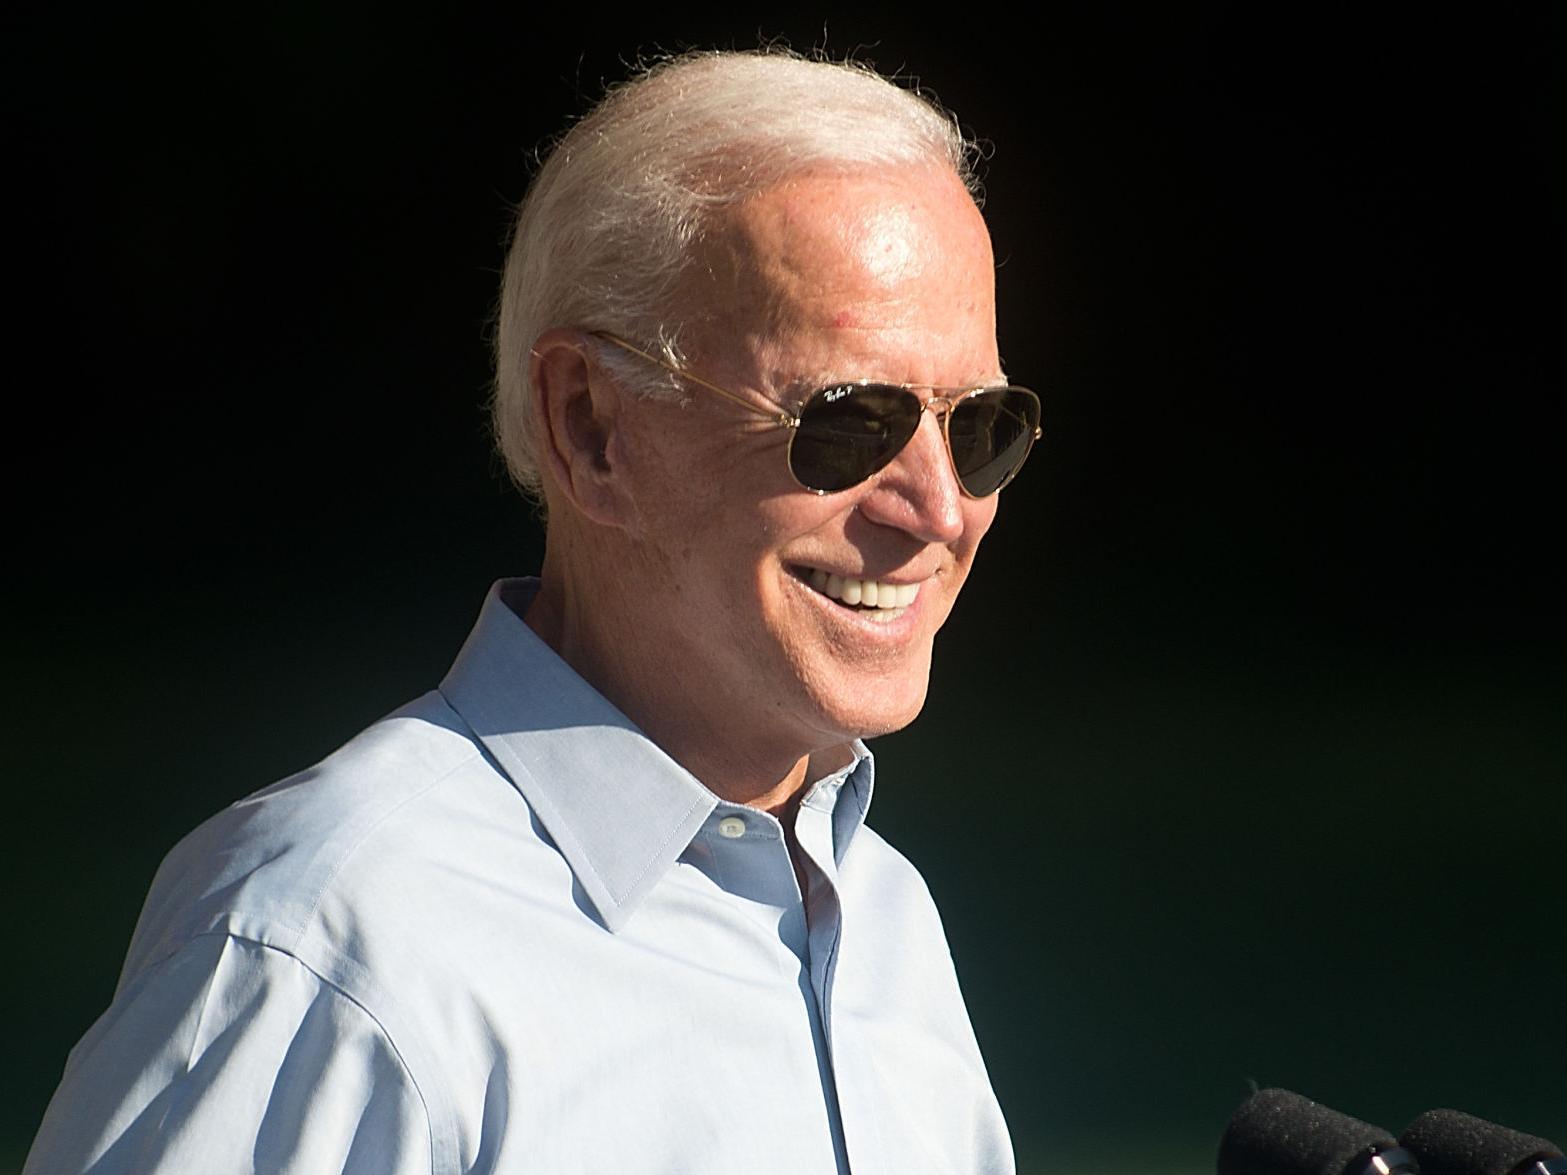 Joe Biden Will Visit Siouxland In 8 Day Iowa Swing Government And Politics Siouxcityjournal Com